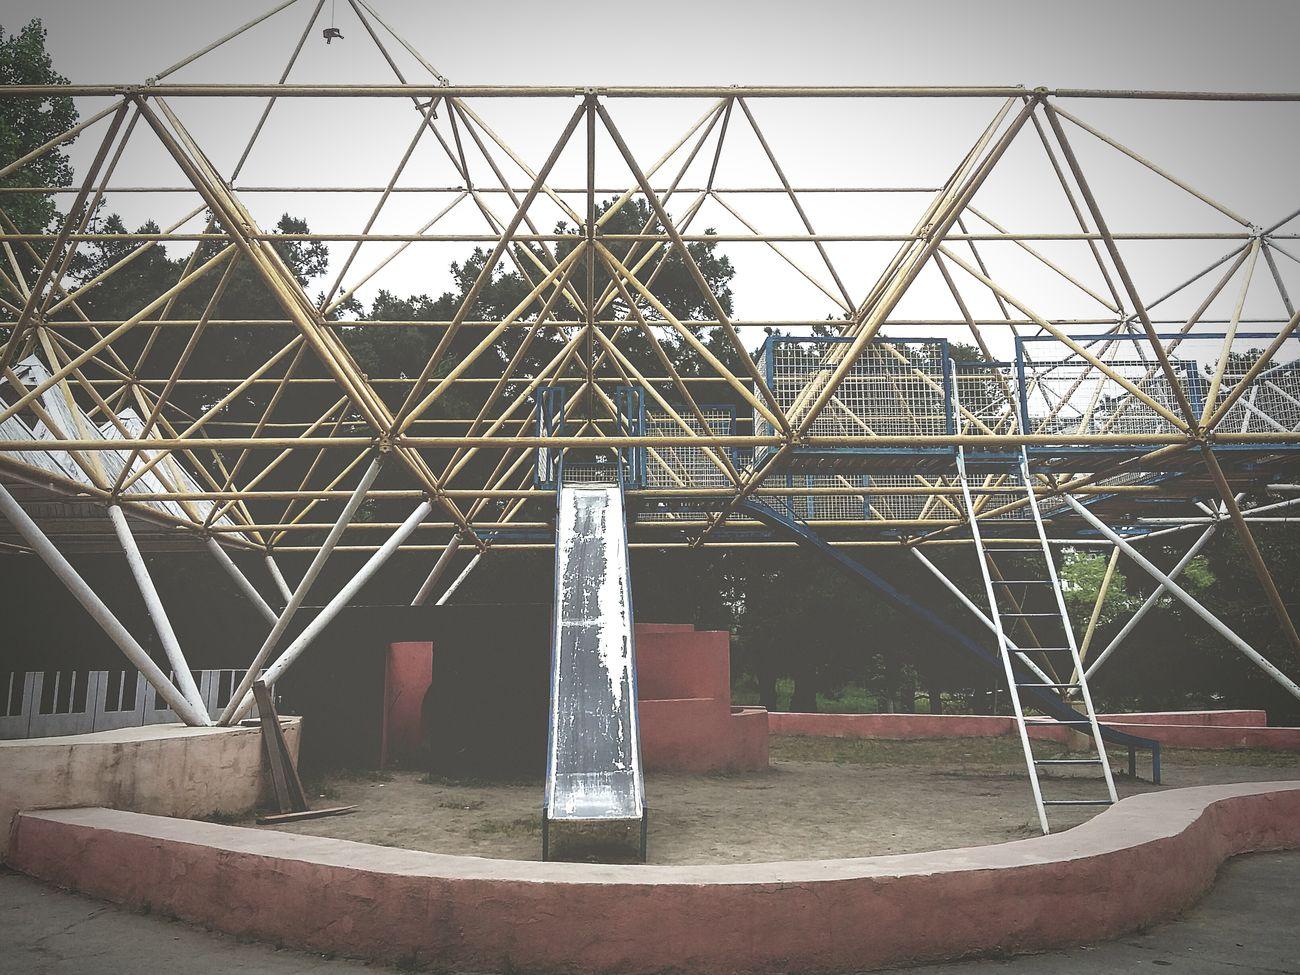 Retro Soviet playground, Tbilisi. First Eyeem Photo